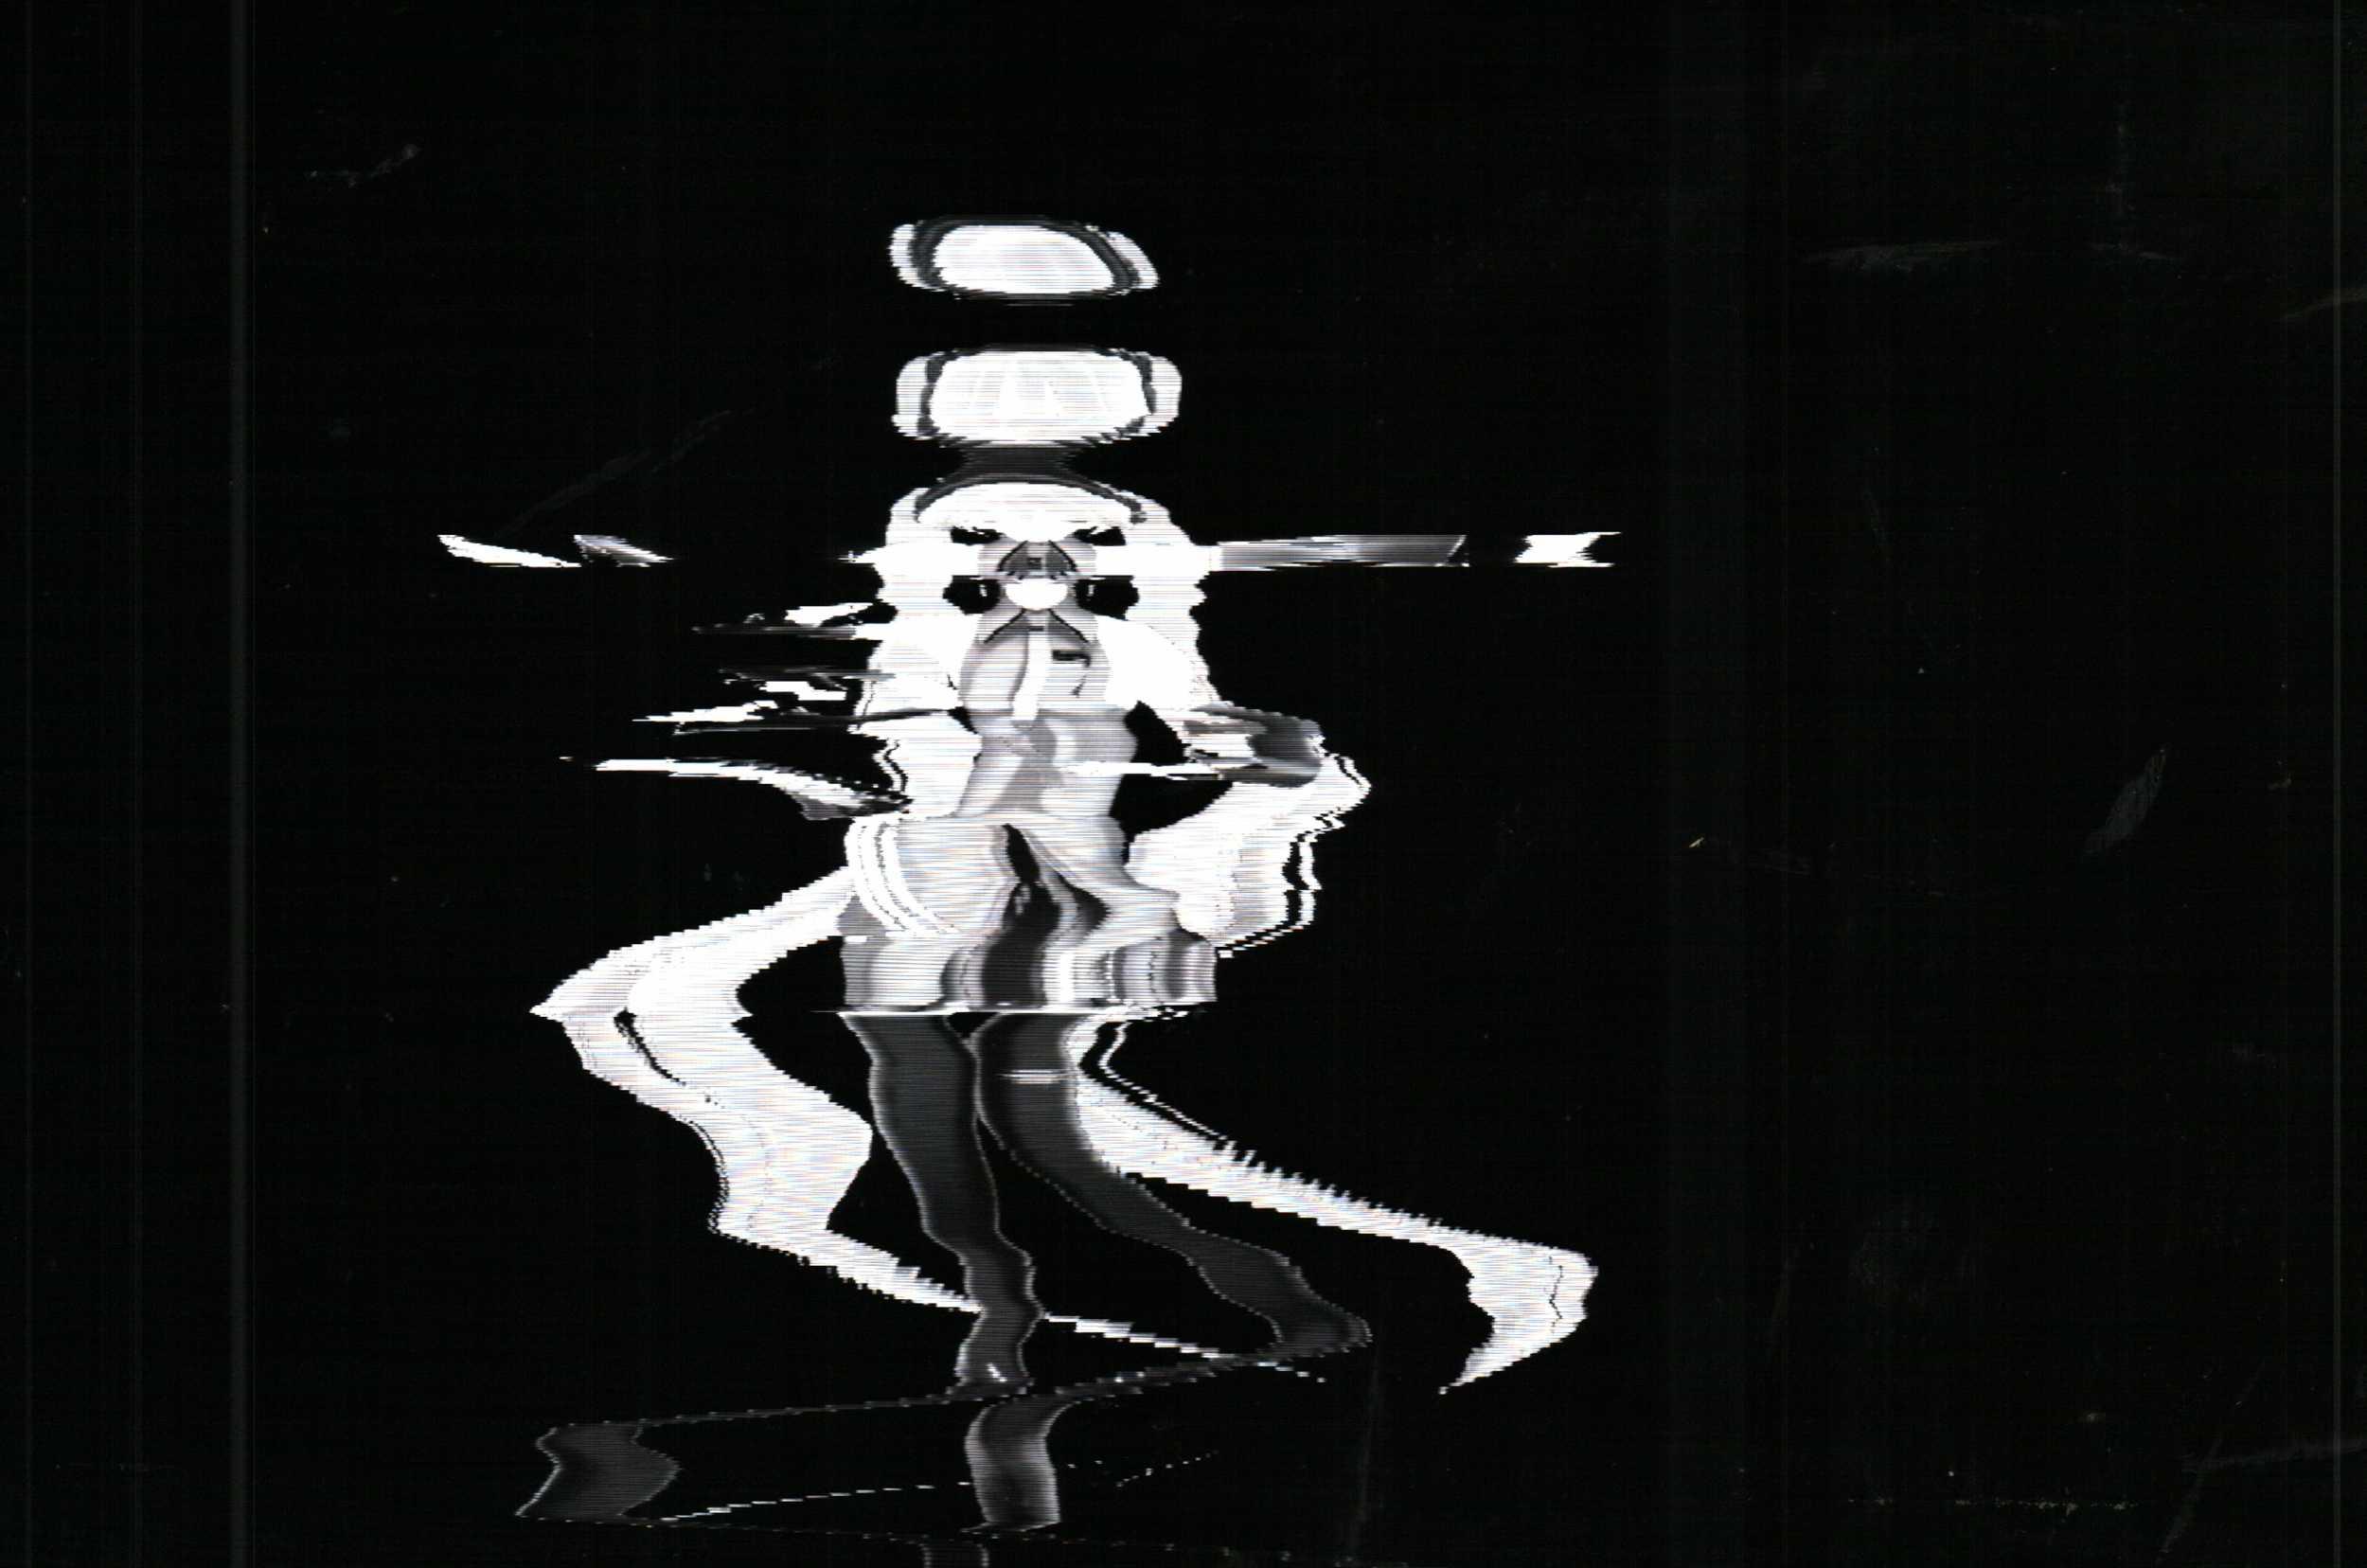 Miku Scan IMAG0112,  Digital Image,  Dimensions Variable, 2016